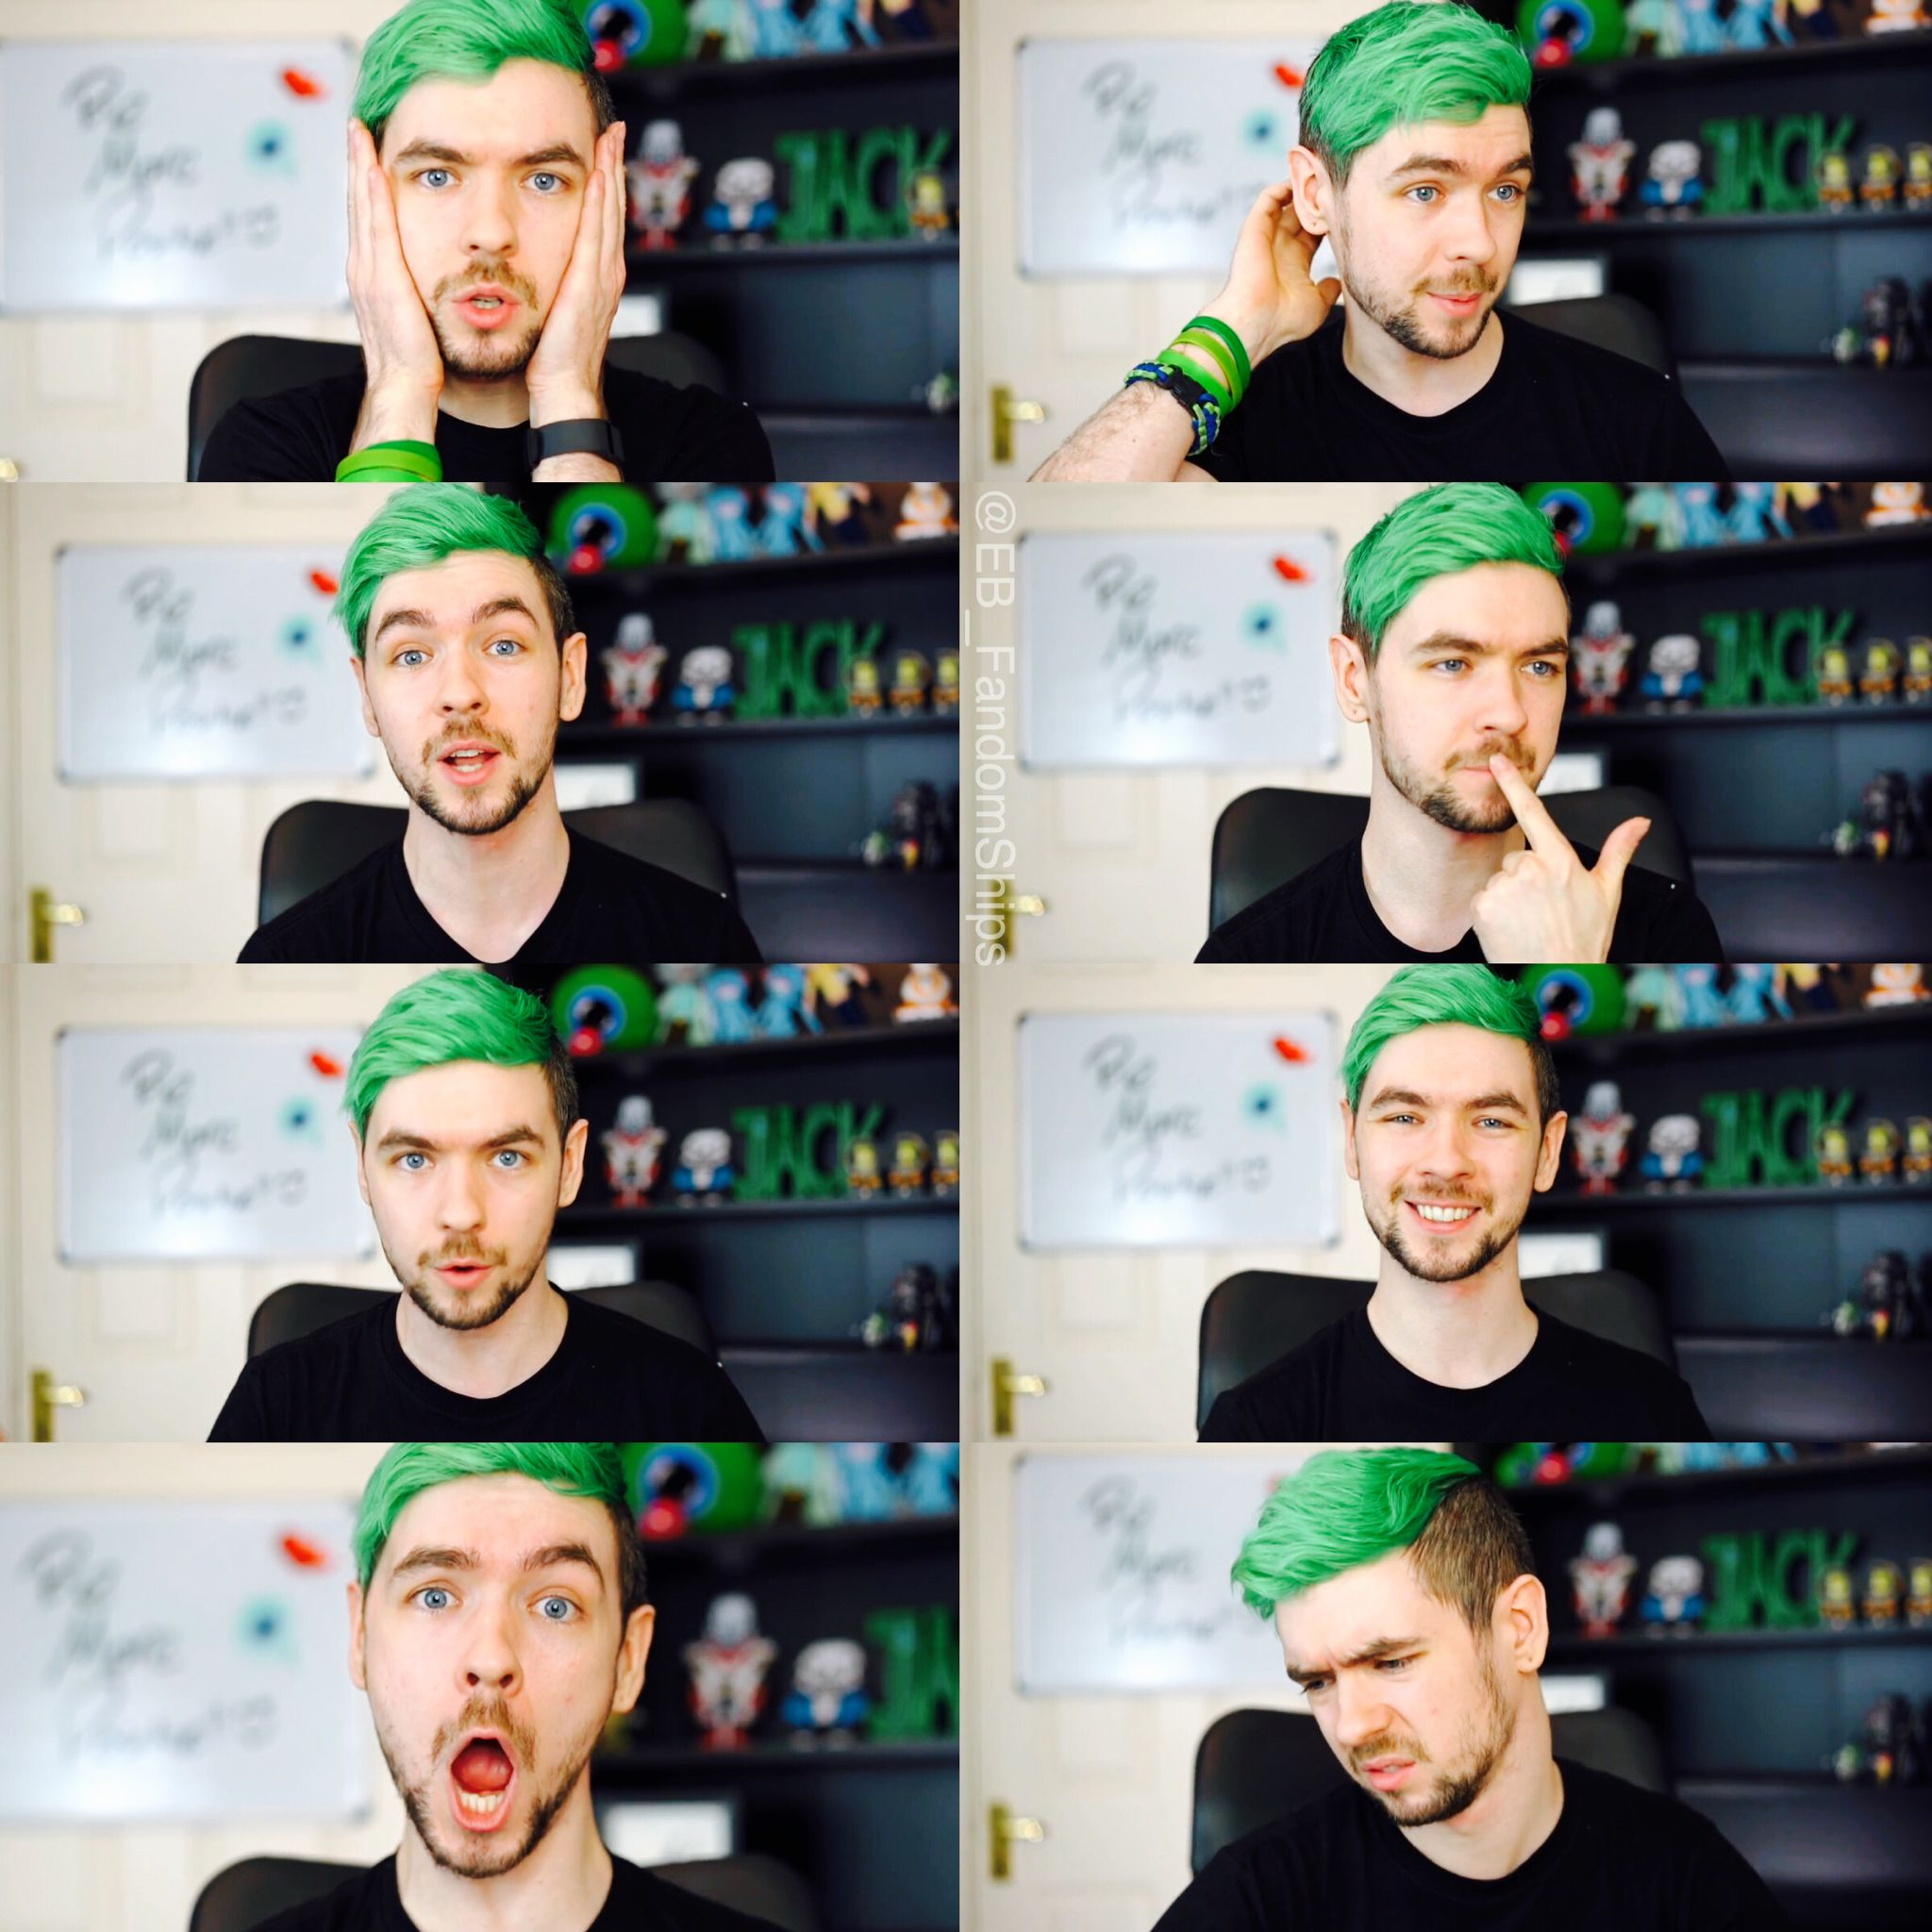 32 Best Jack (Green) images | Markiplier, Sean william